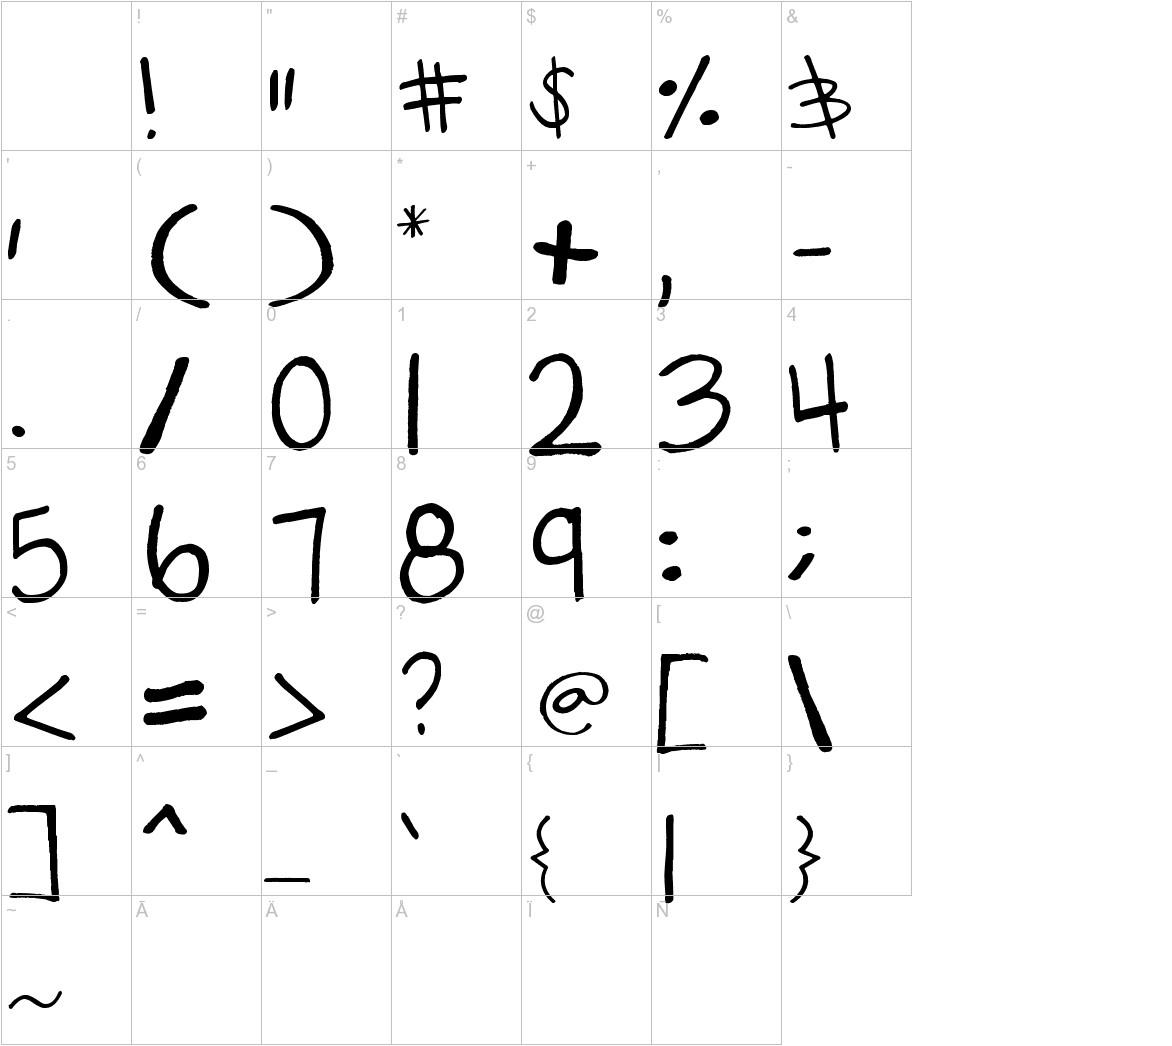 gabiies handwritting characters